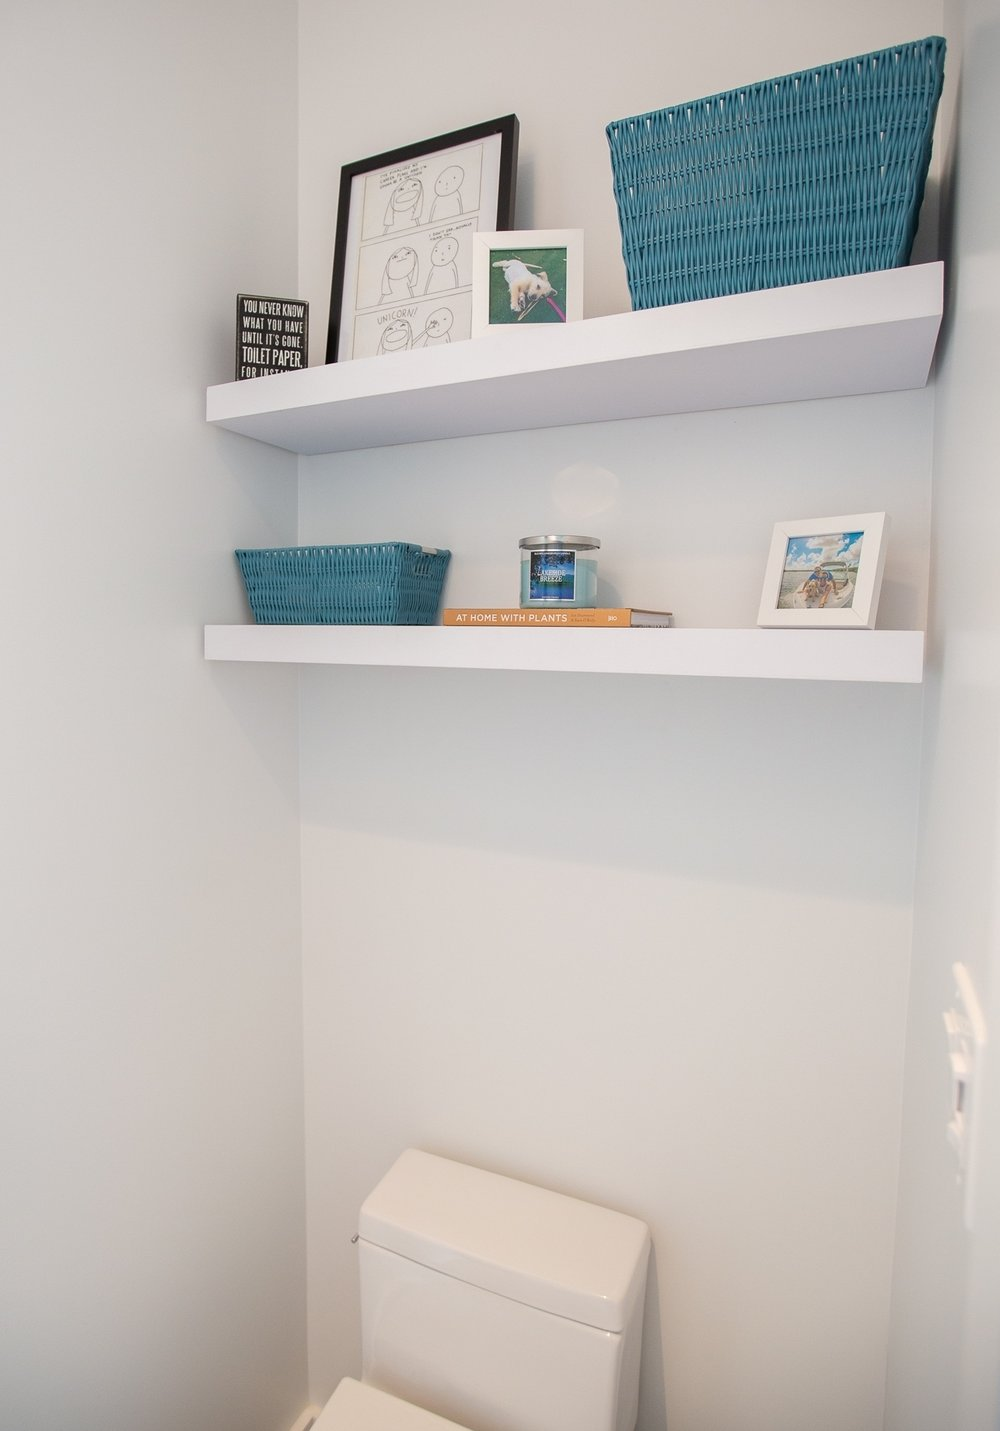 Shelves    //    Frames & baskets    //    Book    //    Wooden sign    //    Candle   //    Photo prints